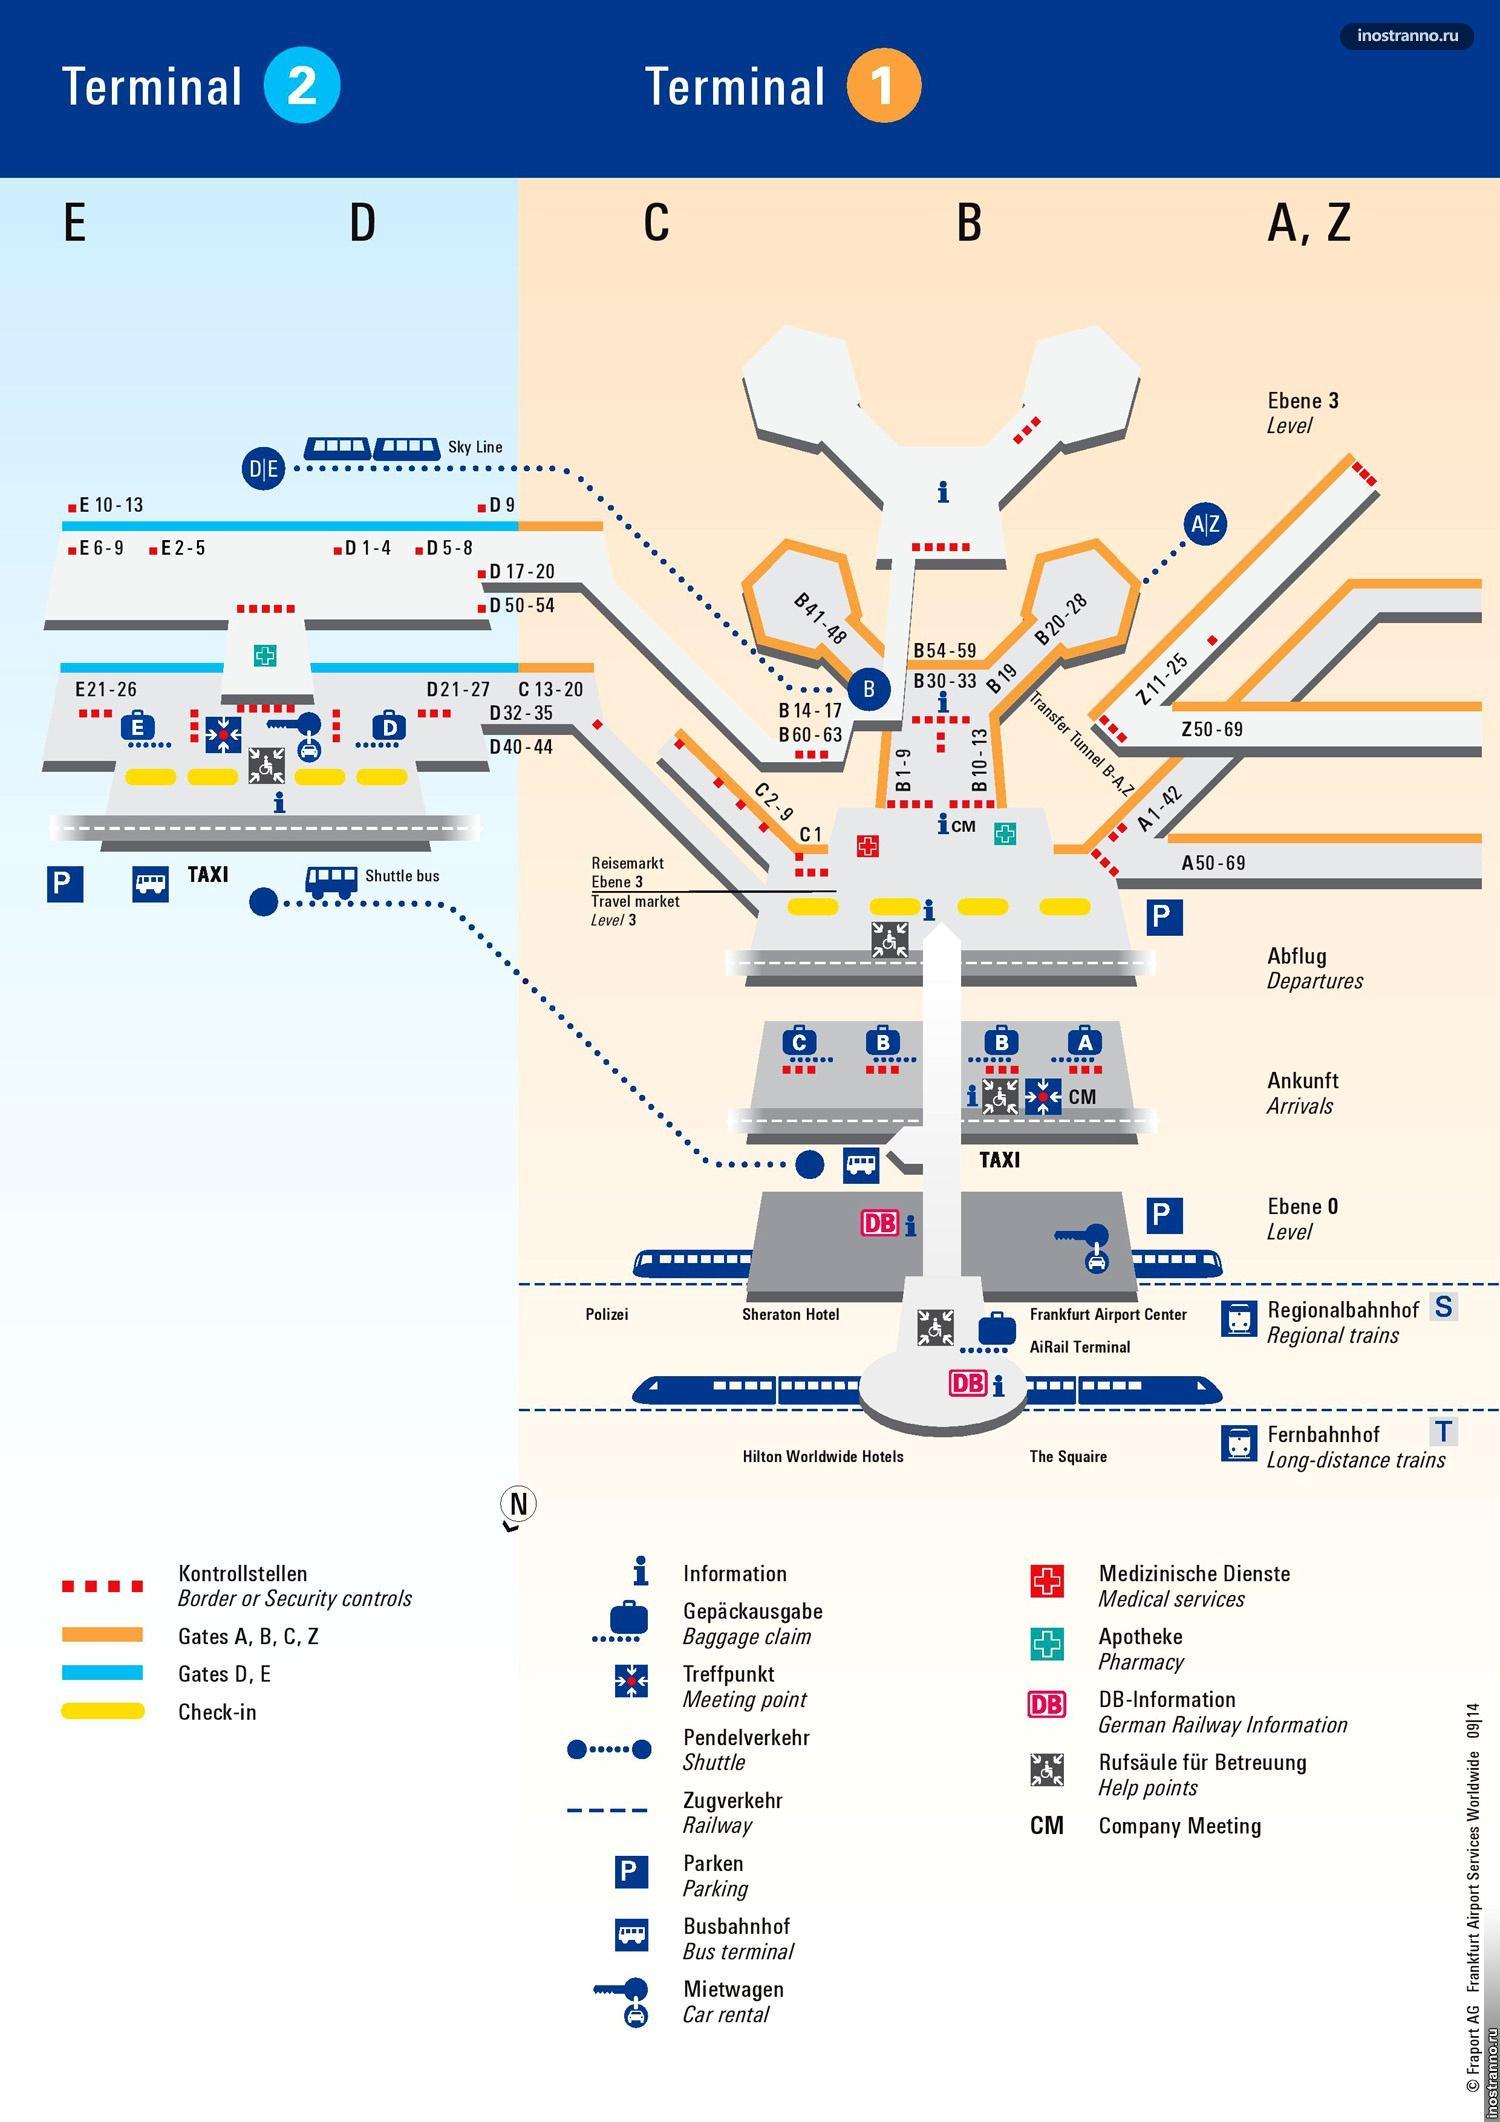 Схема аэропорта мюнхена, карта и план аэропорта мюнхена на русском.